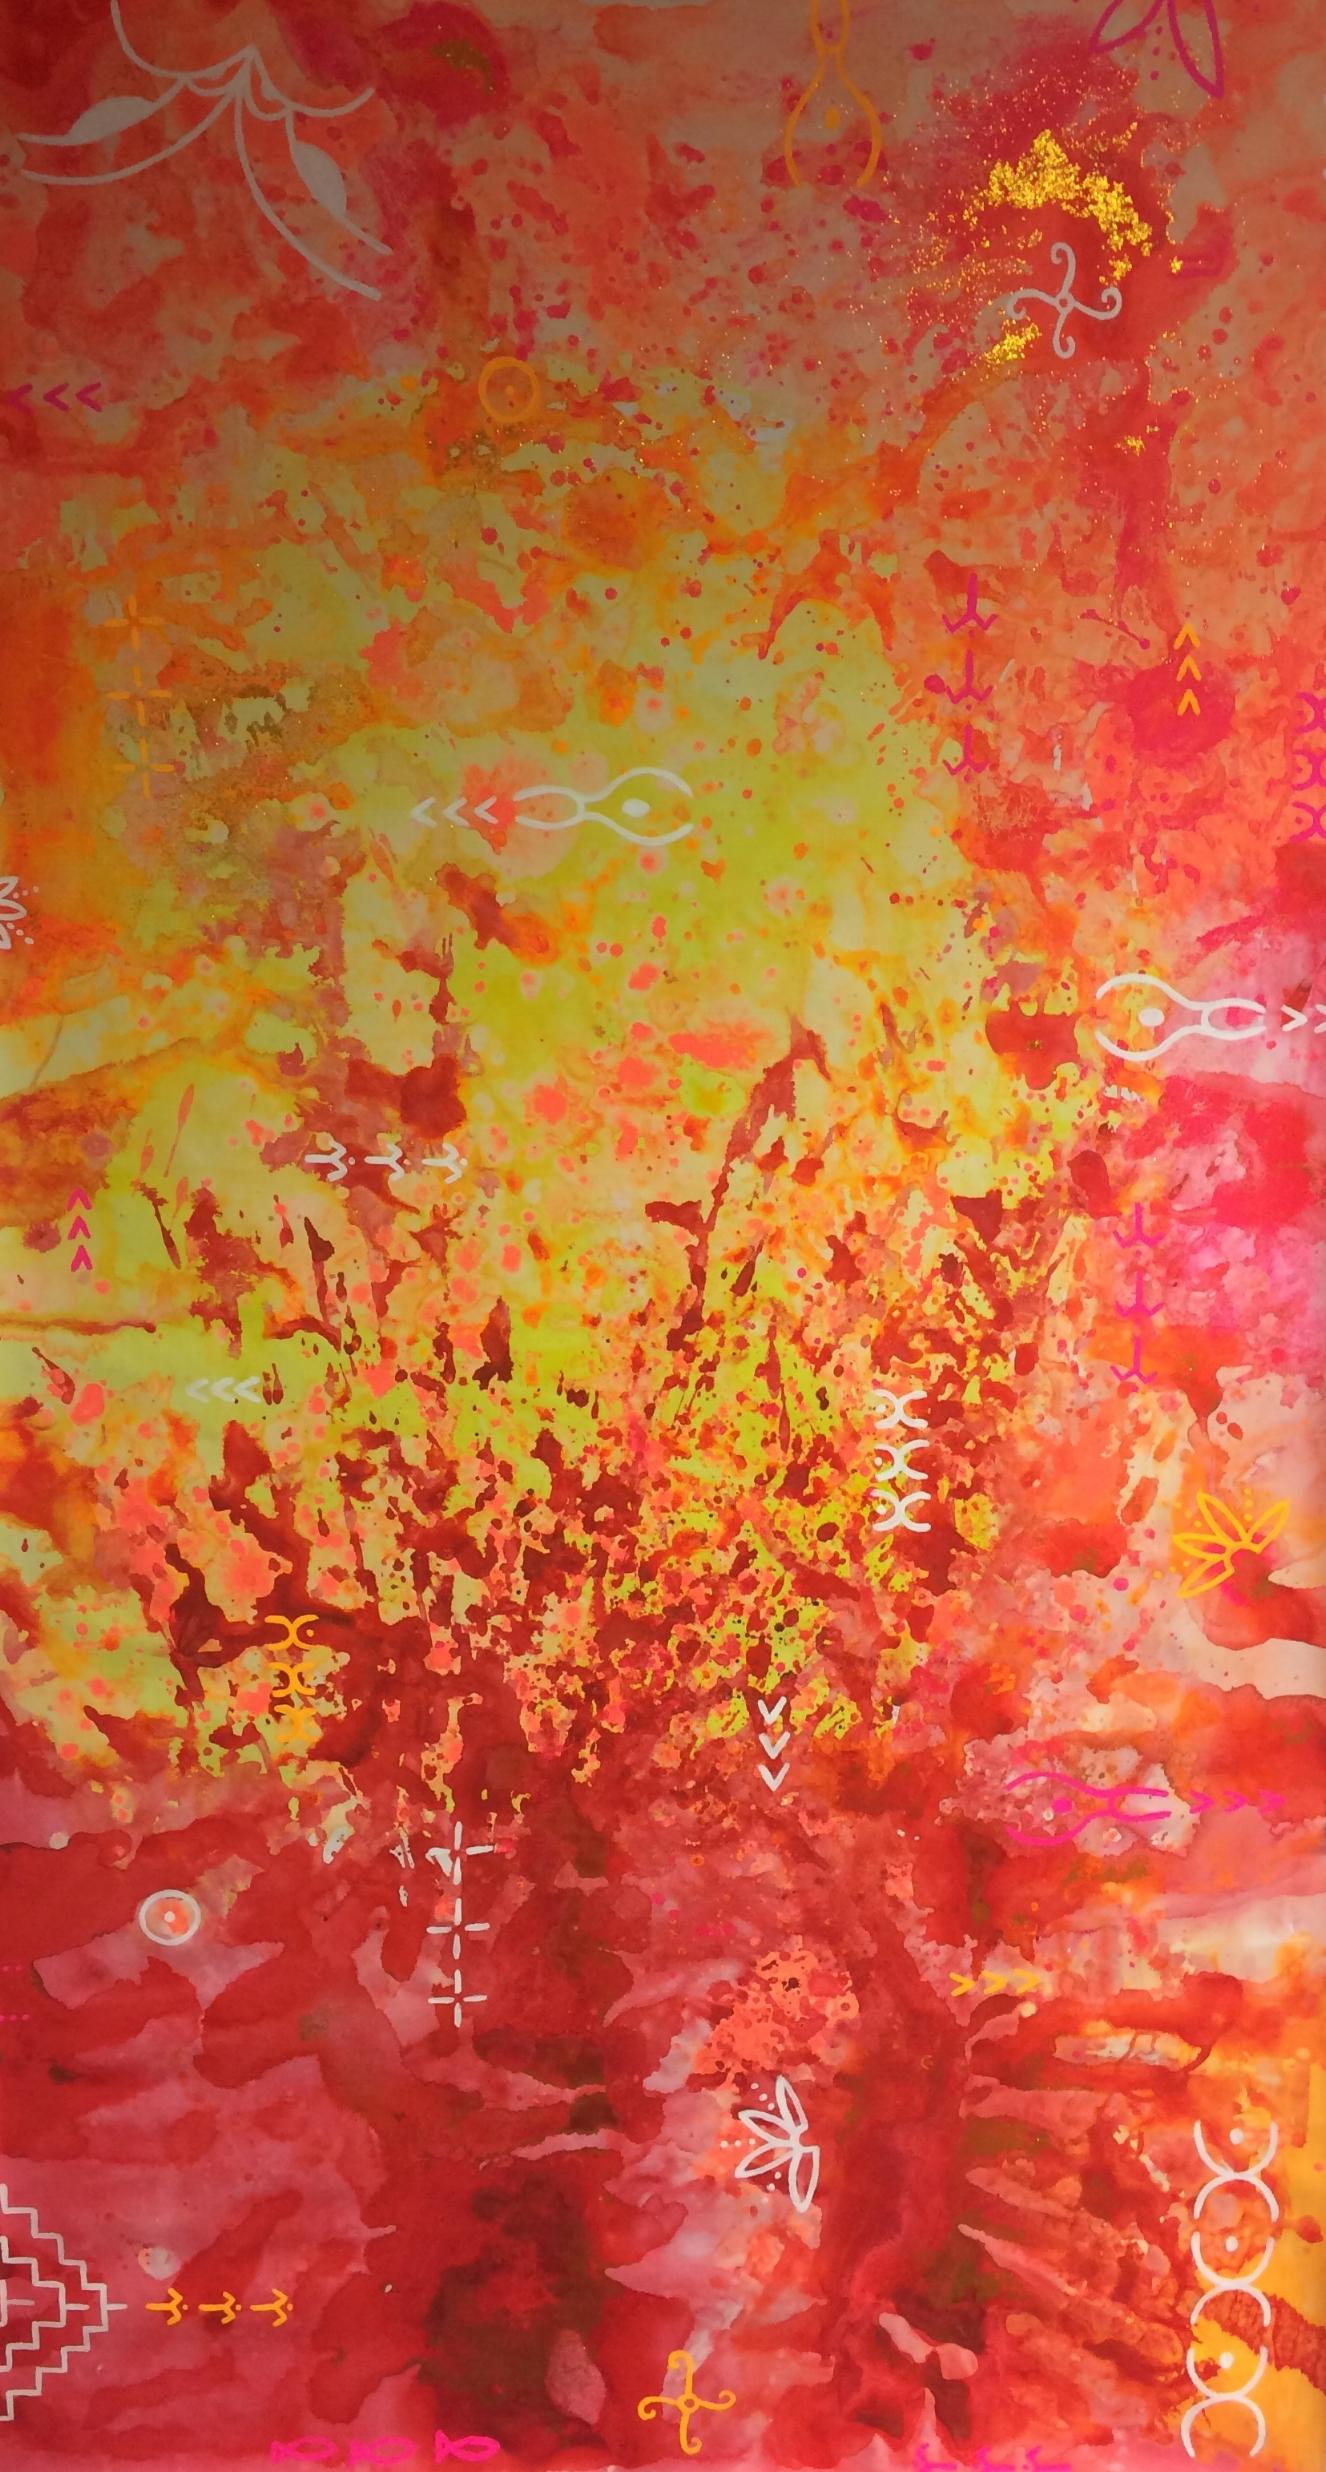 'Ngā tāngata o te rā' by Taryn Beri.